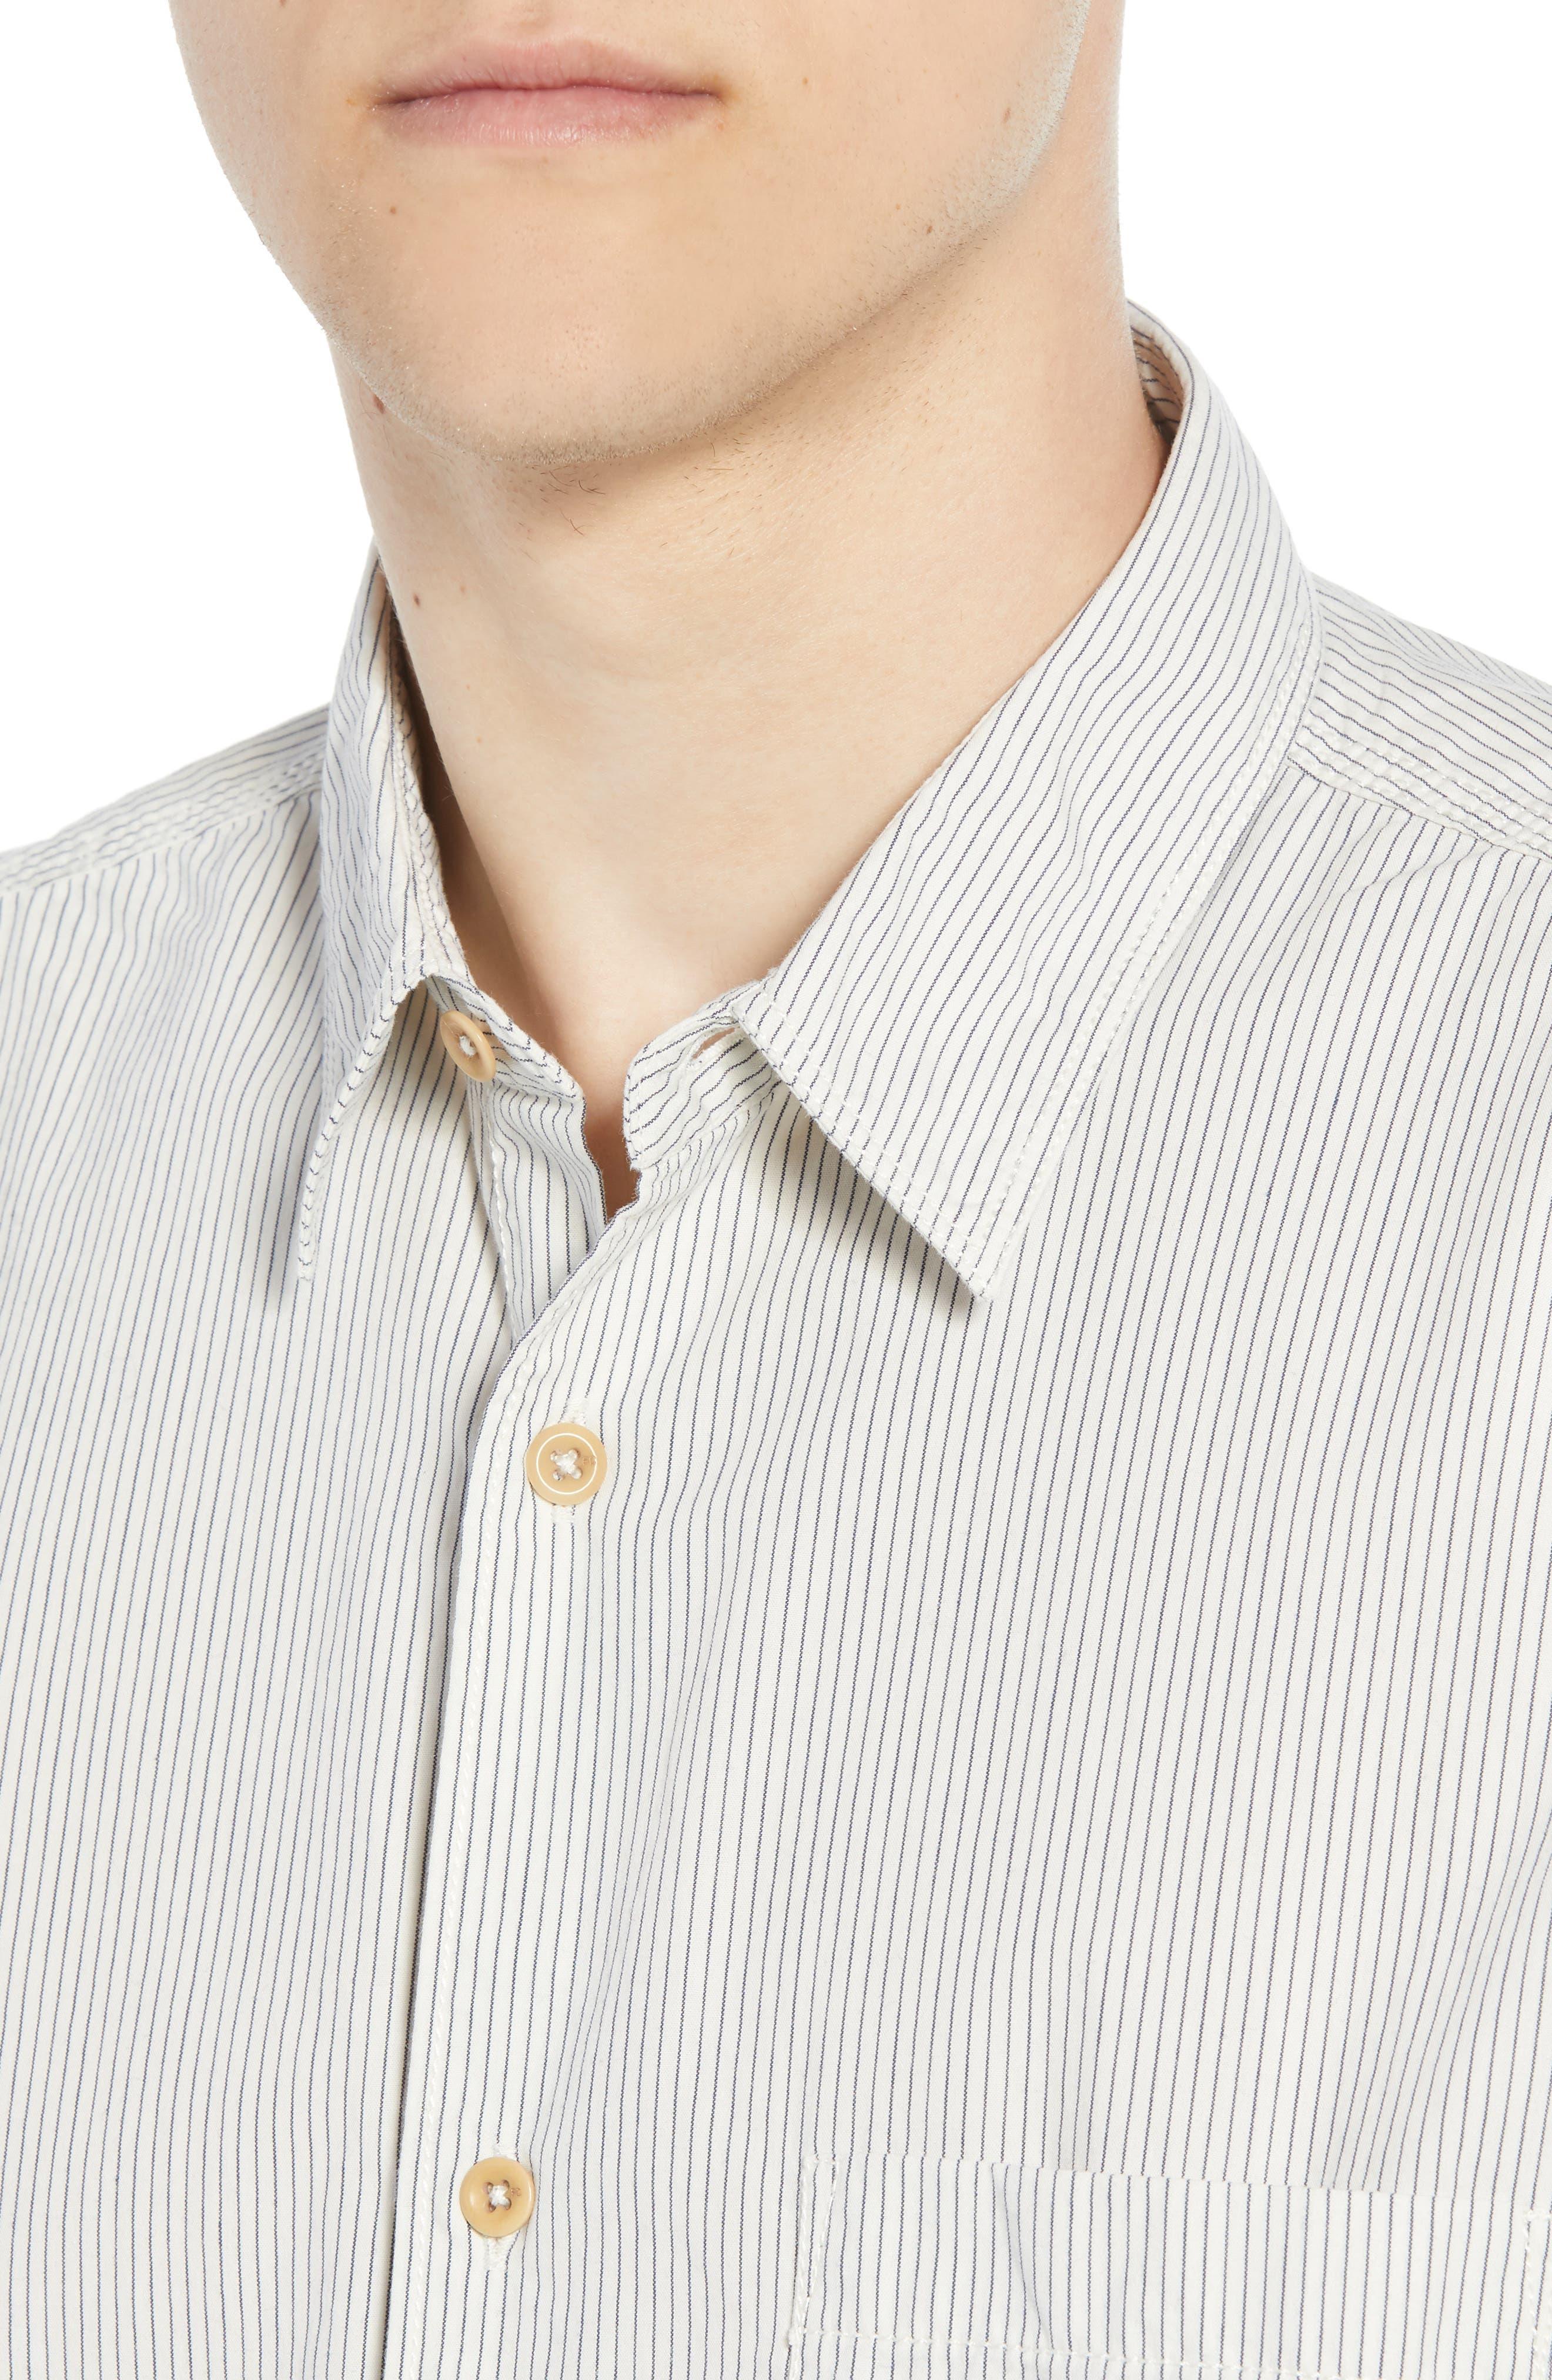 Core Peach Regular Fit Sport Shirt,                             Alternate thumbnail 2, color,                             400